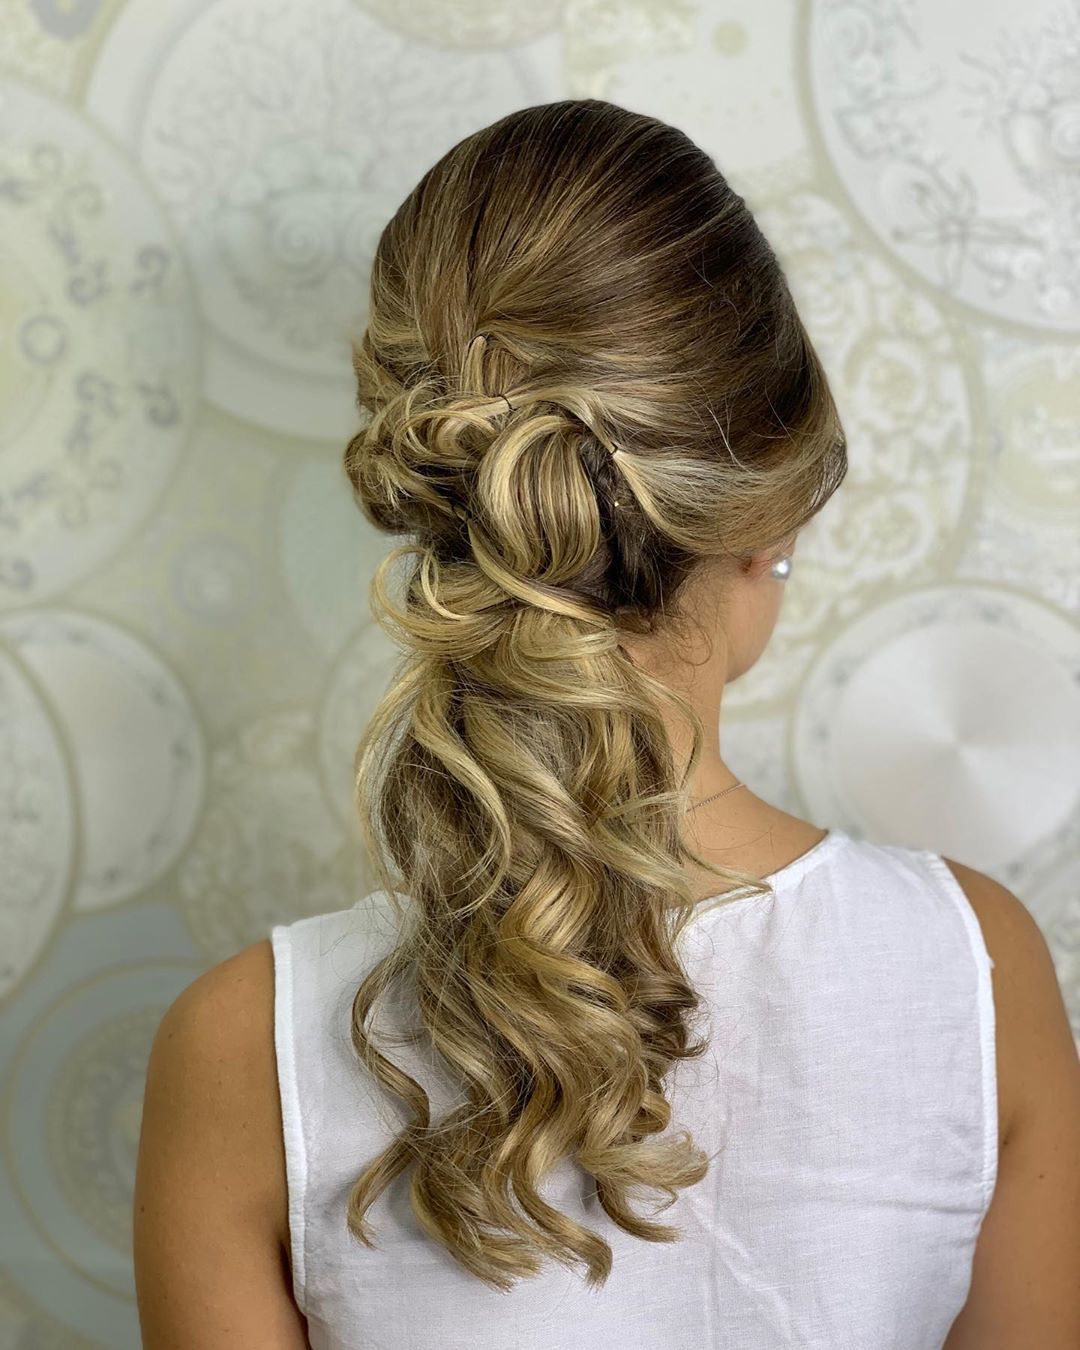 Foto 24 de Salón de peluquería y estética en  | Salón de Belleza David Danielle